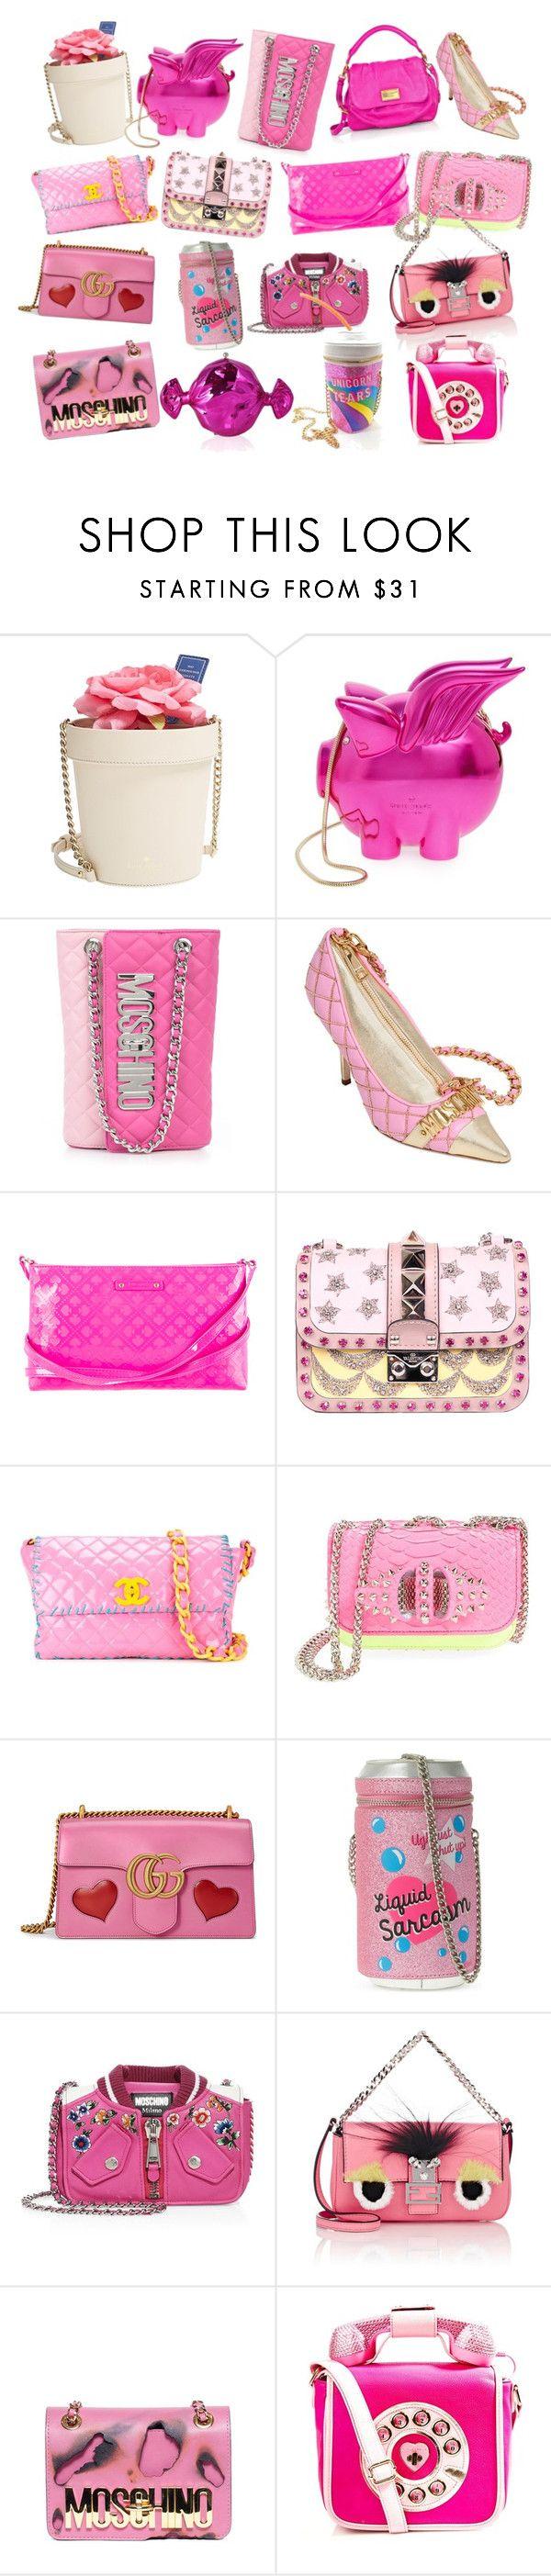 """Pink Handbags"" by sofi6277 on Polyvore featuring moda, Kate Spade, Moschino, Valentino, Chanel, Christian Louboutin, Gucci, Skinnydip, Fendi y Betsey Johnson"